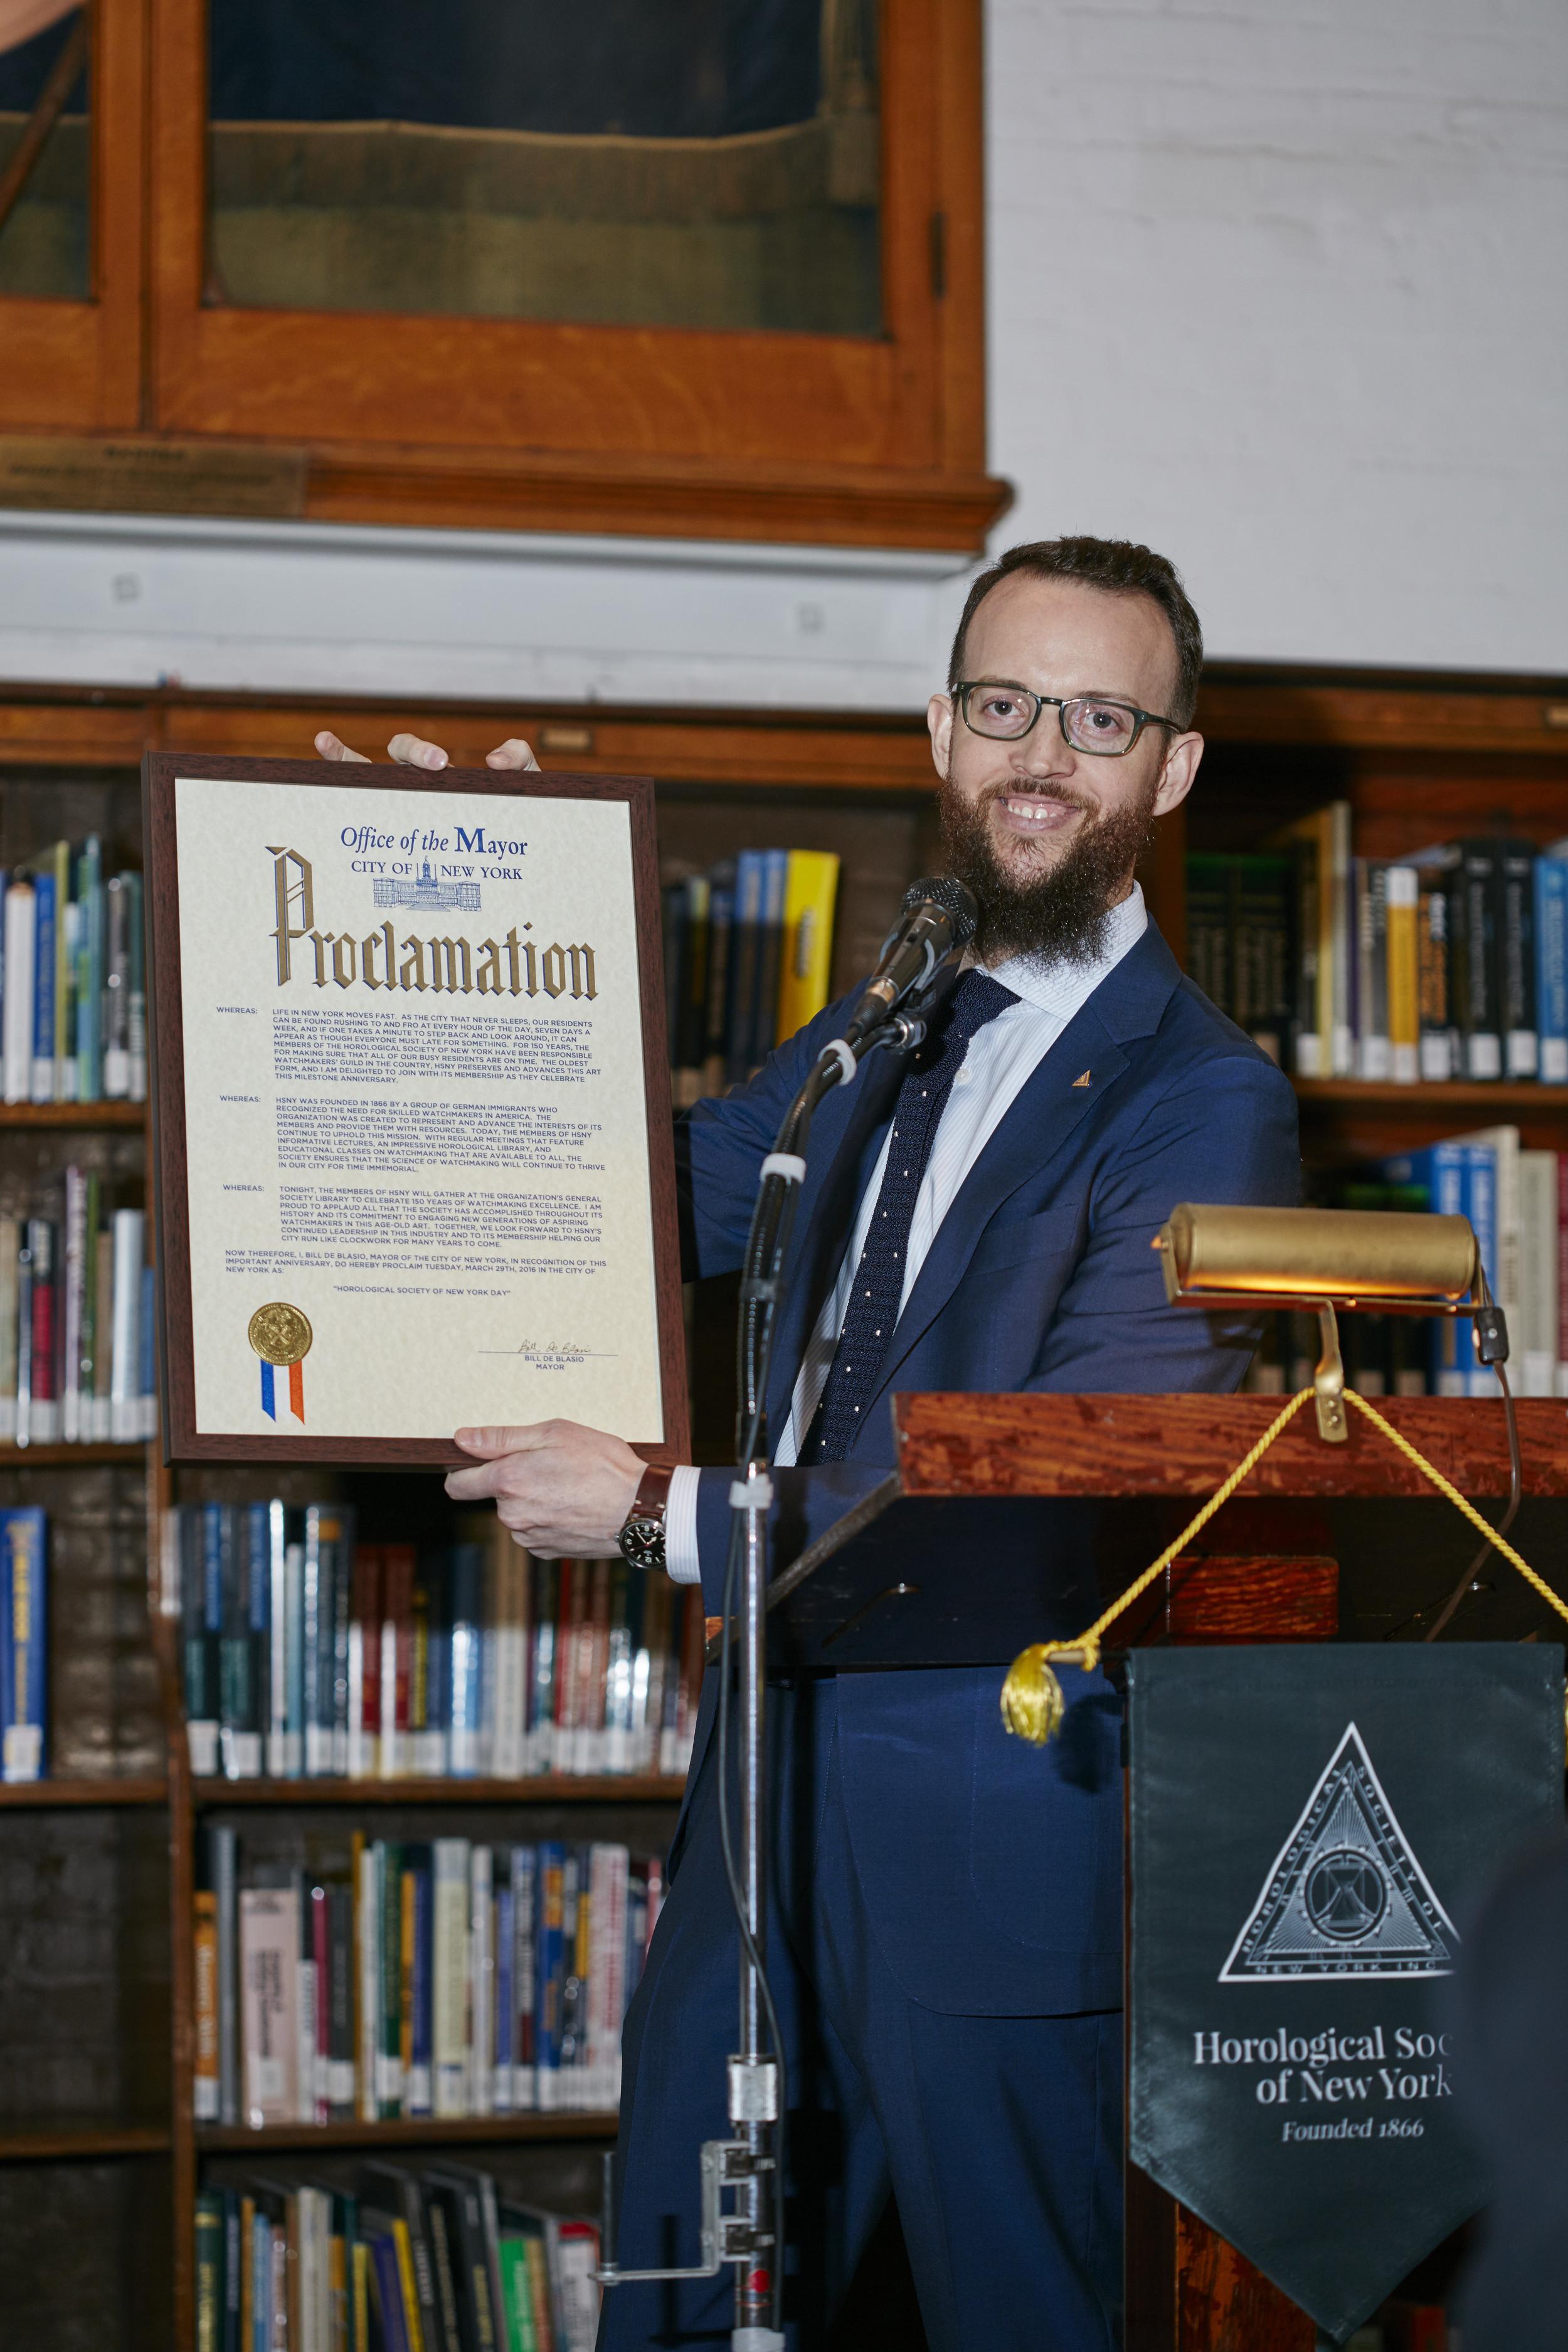 Nicholas Manousos, Vice President of HSNY,presenting a proclamation from New York City Mayor Bill de Blasio